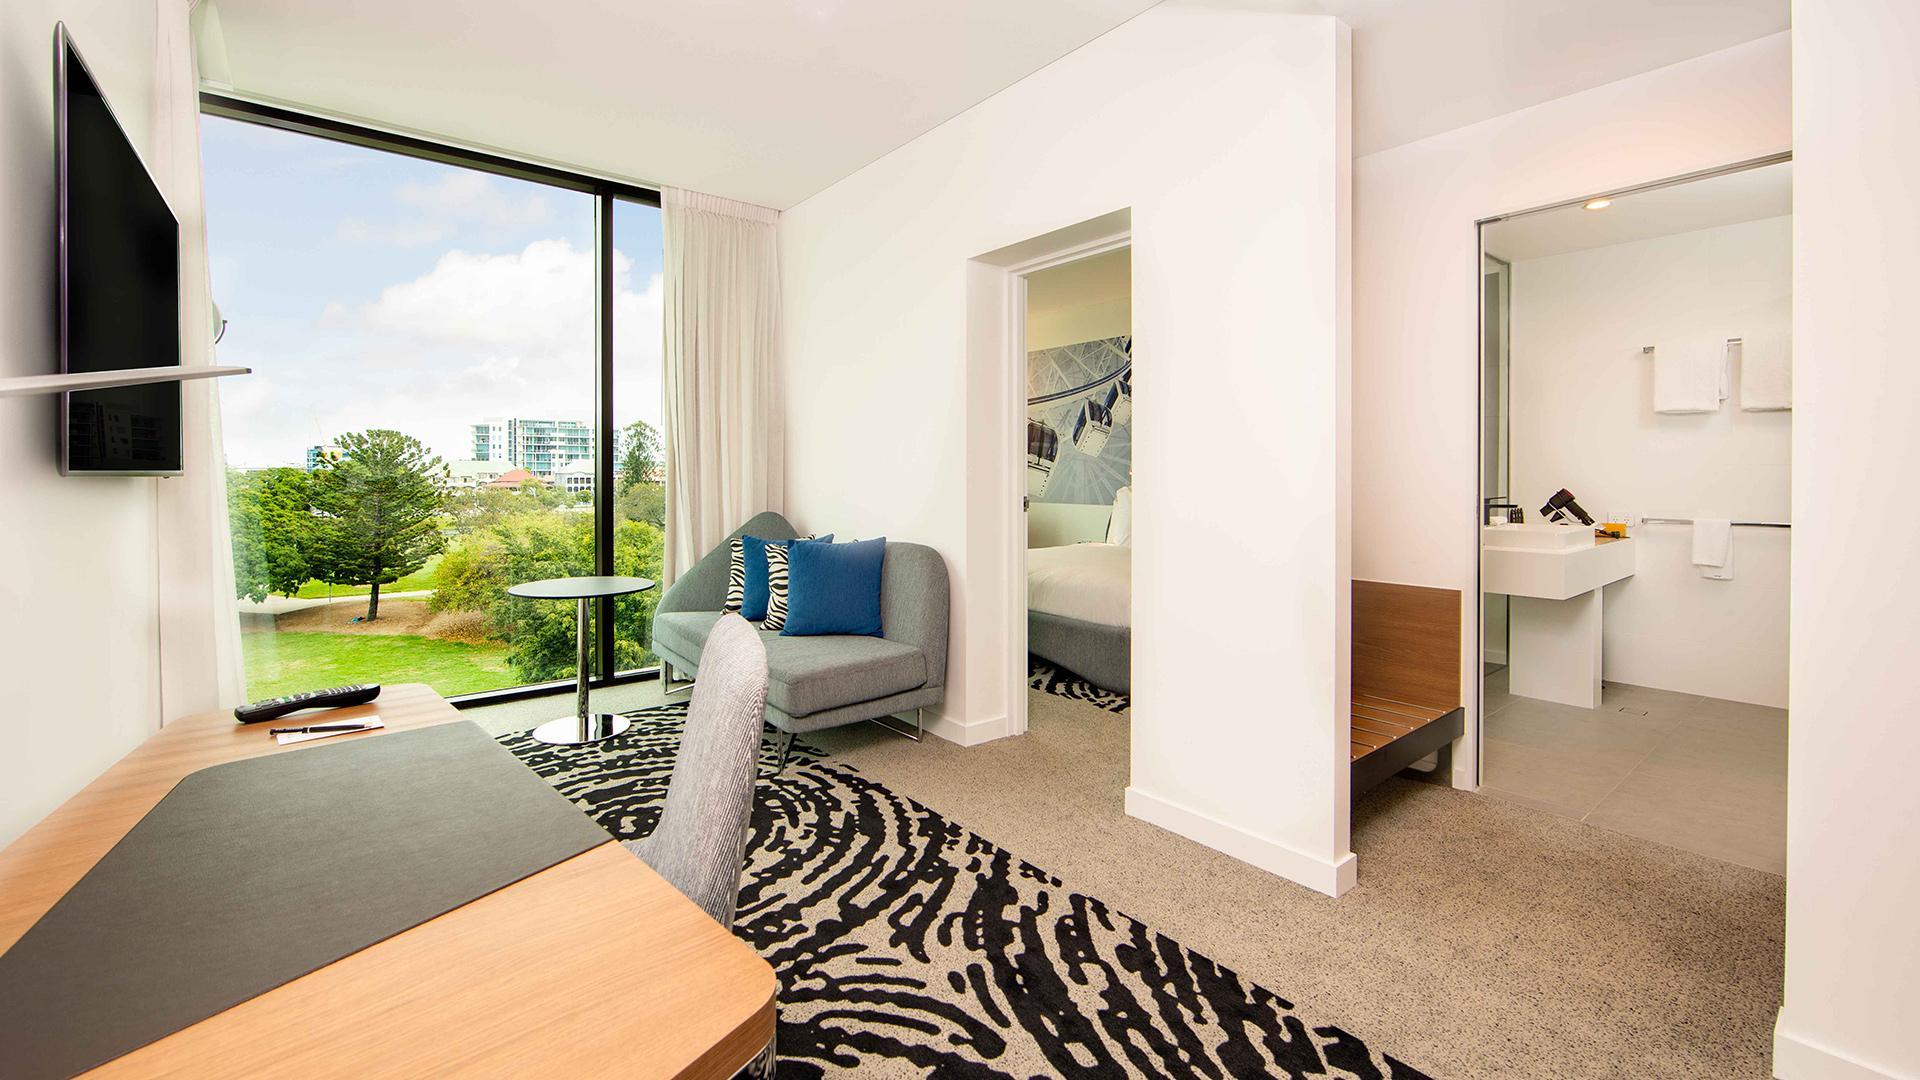 Junior 'N' Suite image 1 at Novotel Brisbane South Bank by Brisbane City, Queensland, Australia